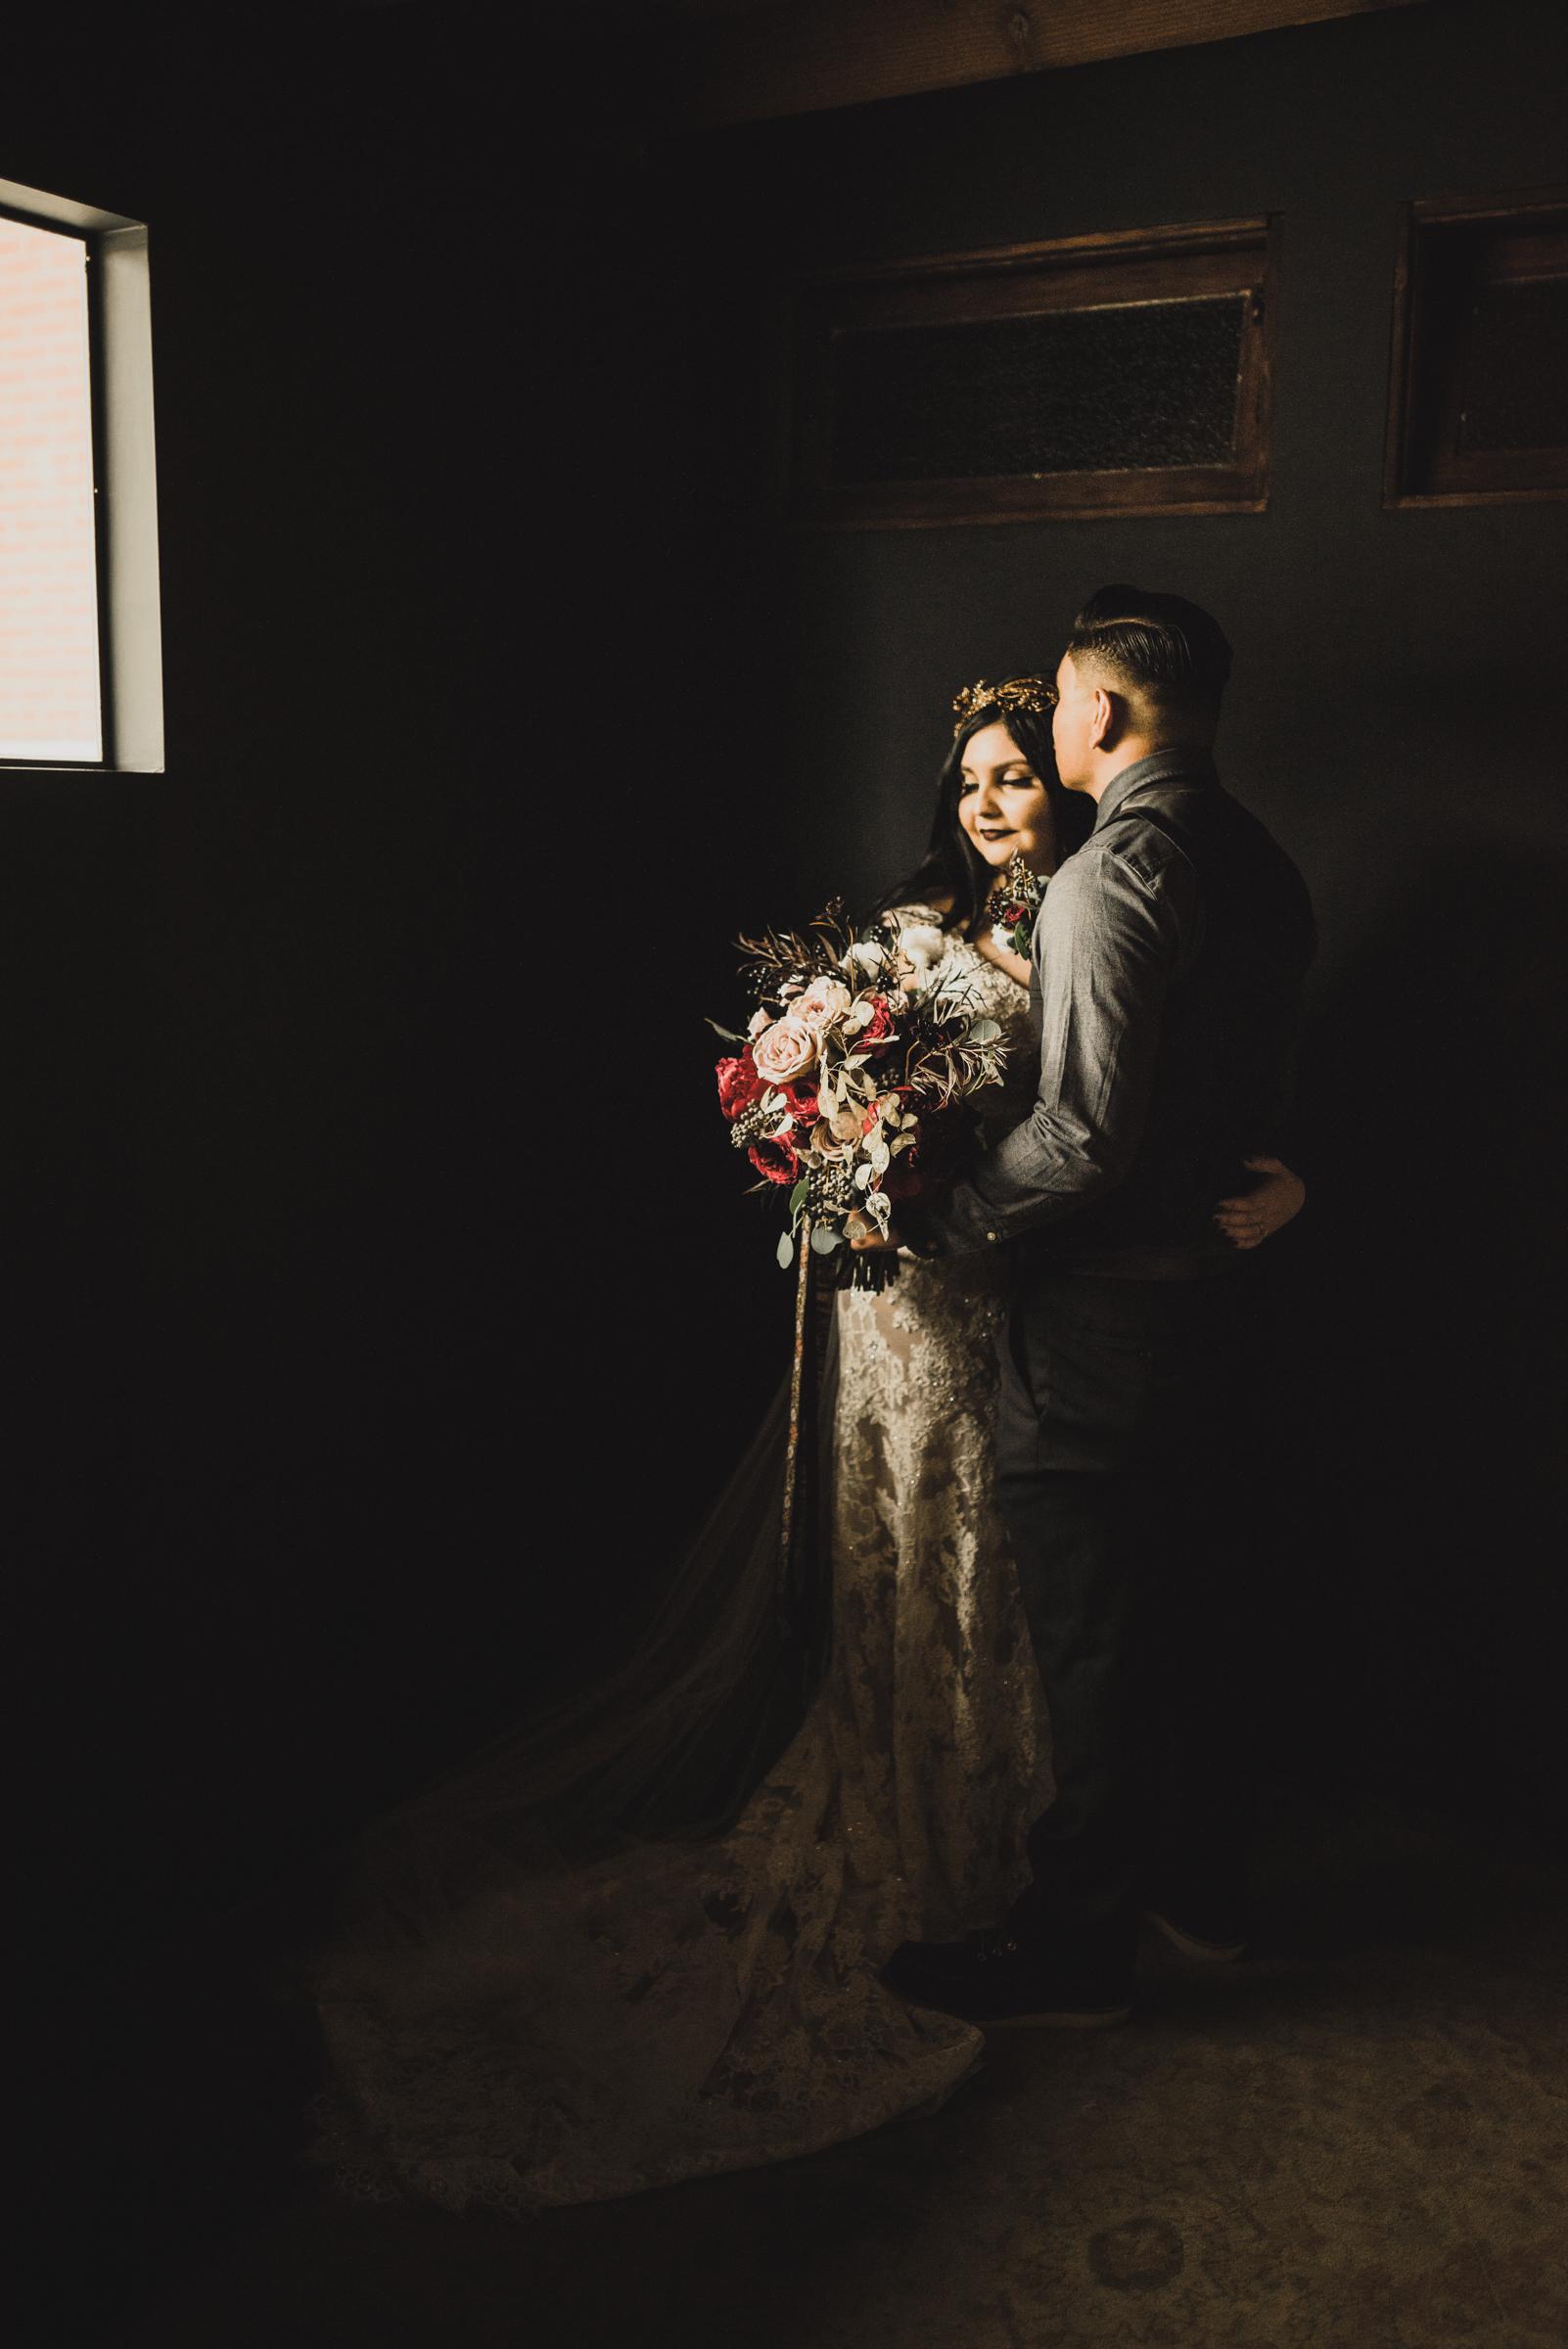 ©Isaiah + Taylor Photography - Smoky Hollow Studios Wedding, El Segundo, Los Angeles Wedding Photographer-62.jpg